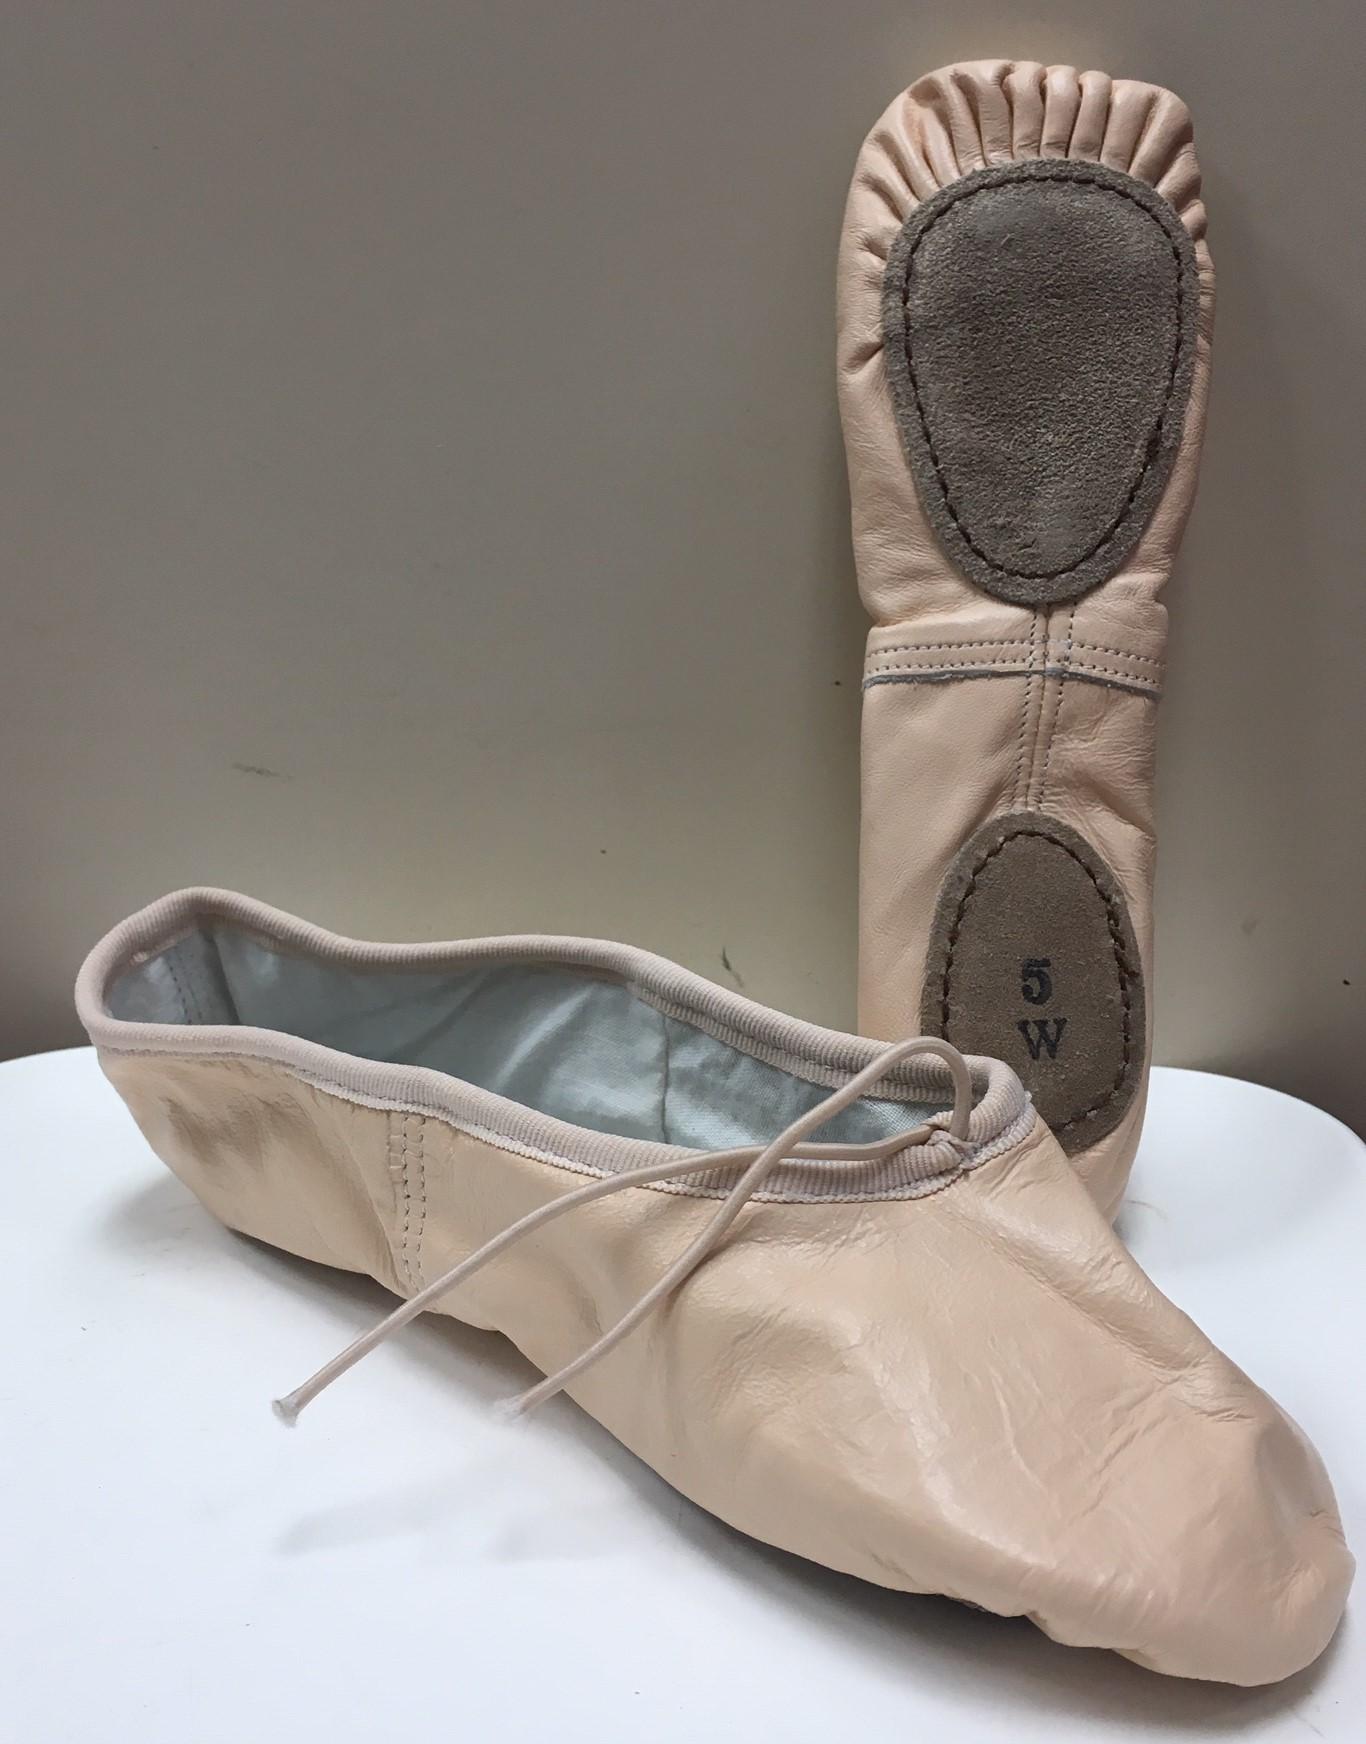 Barry's Split Sole Leather Ballet Shoes